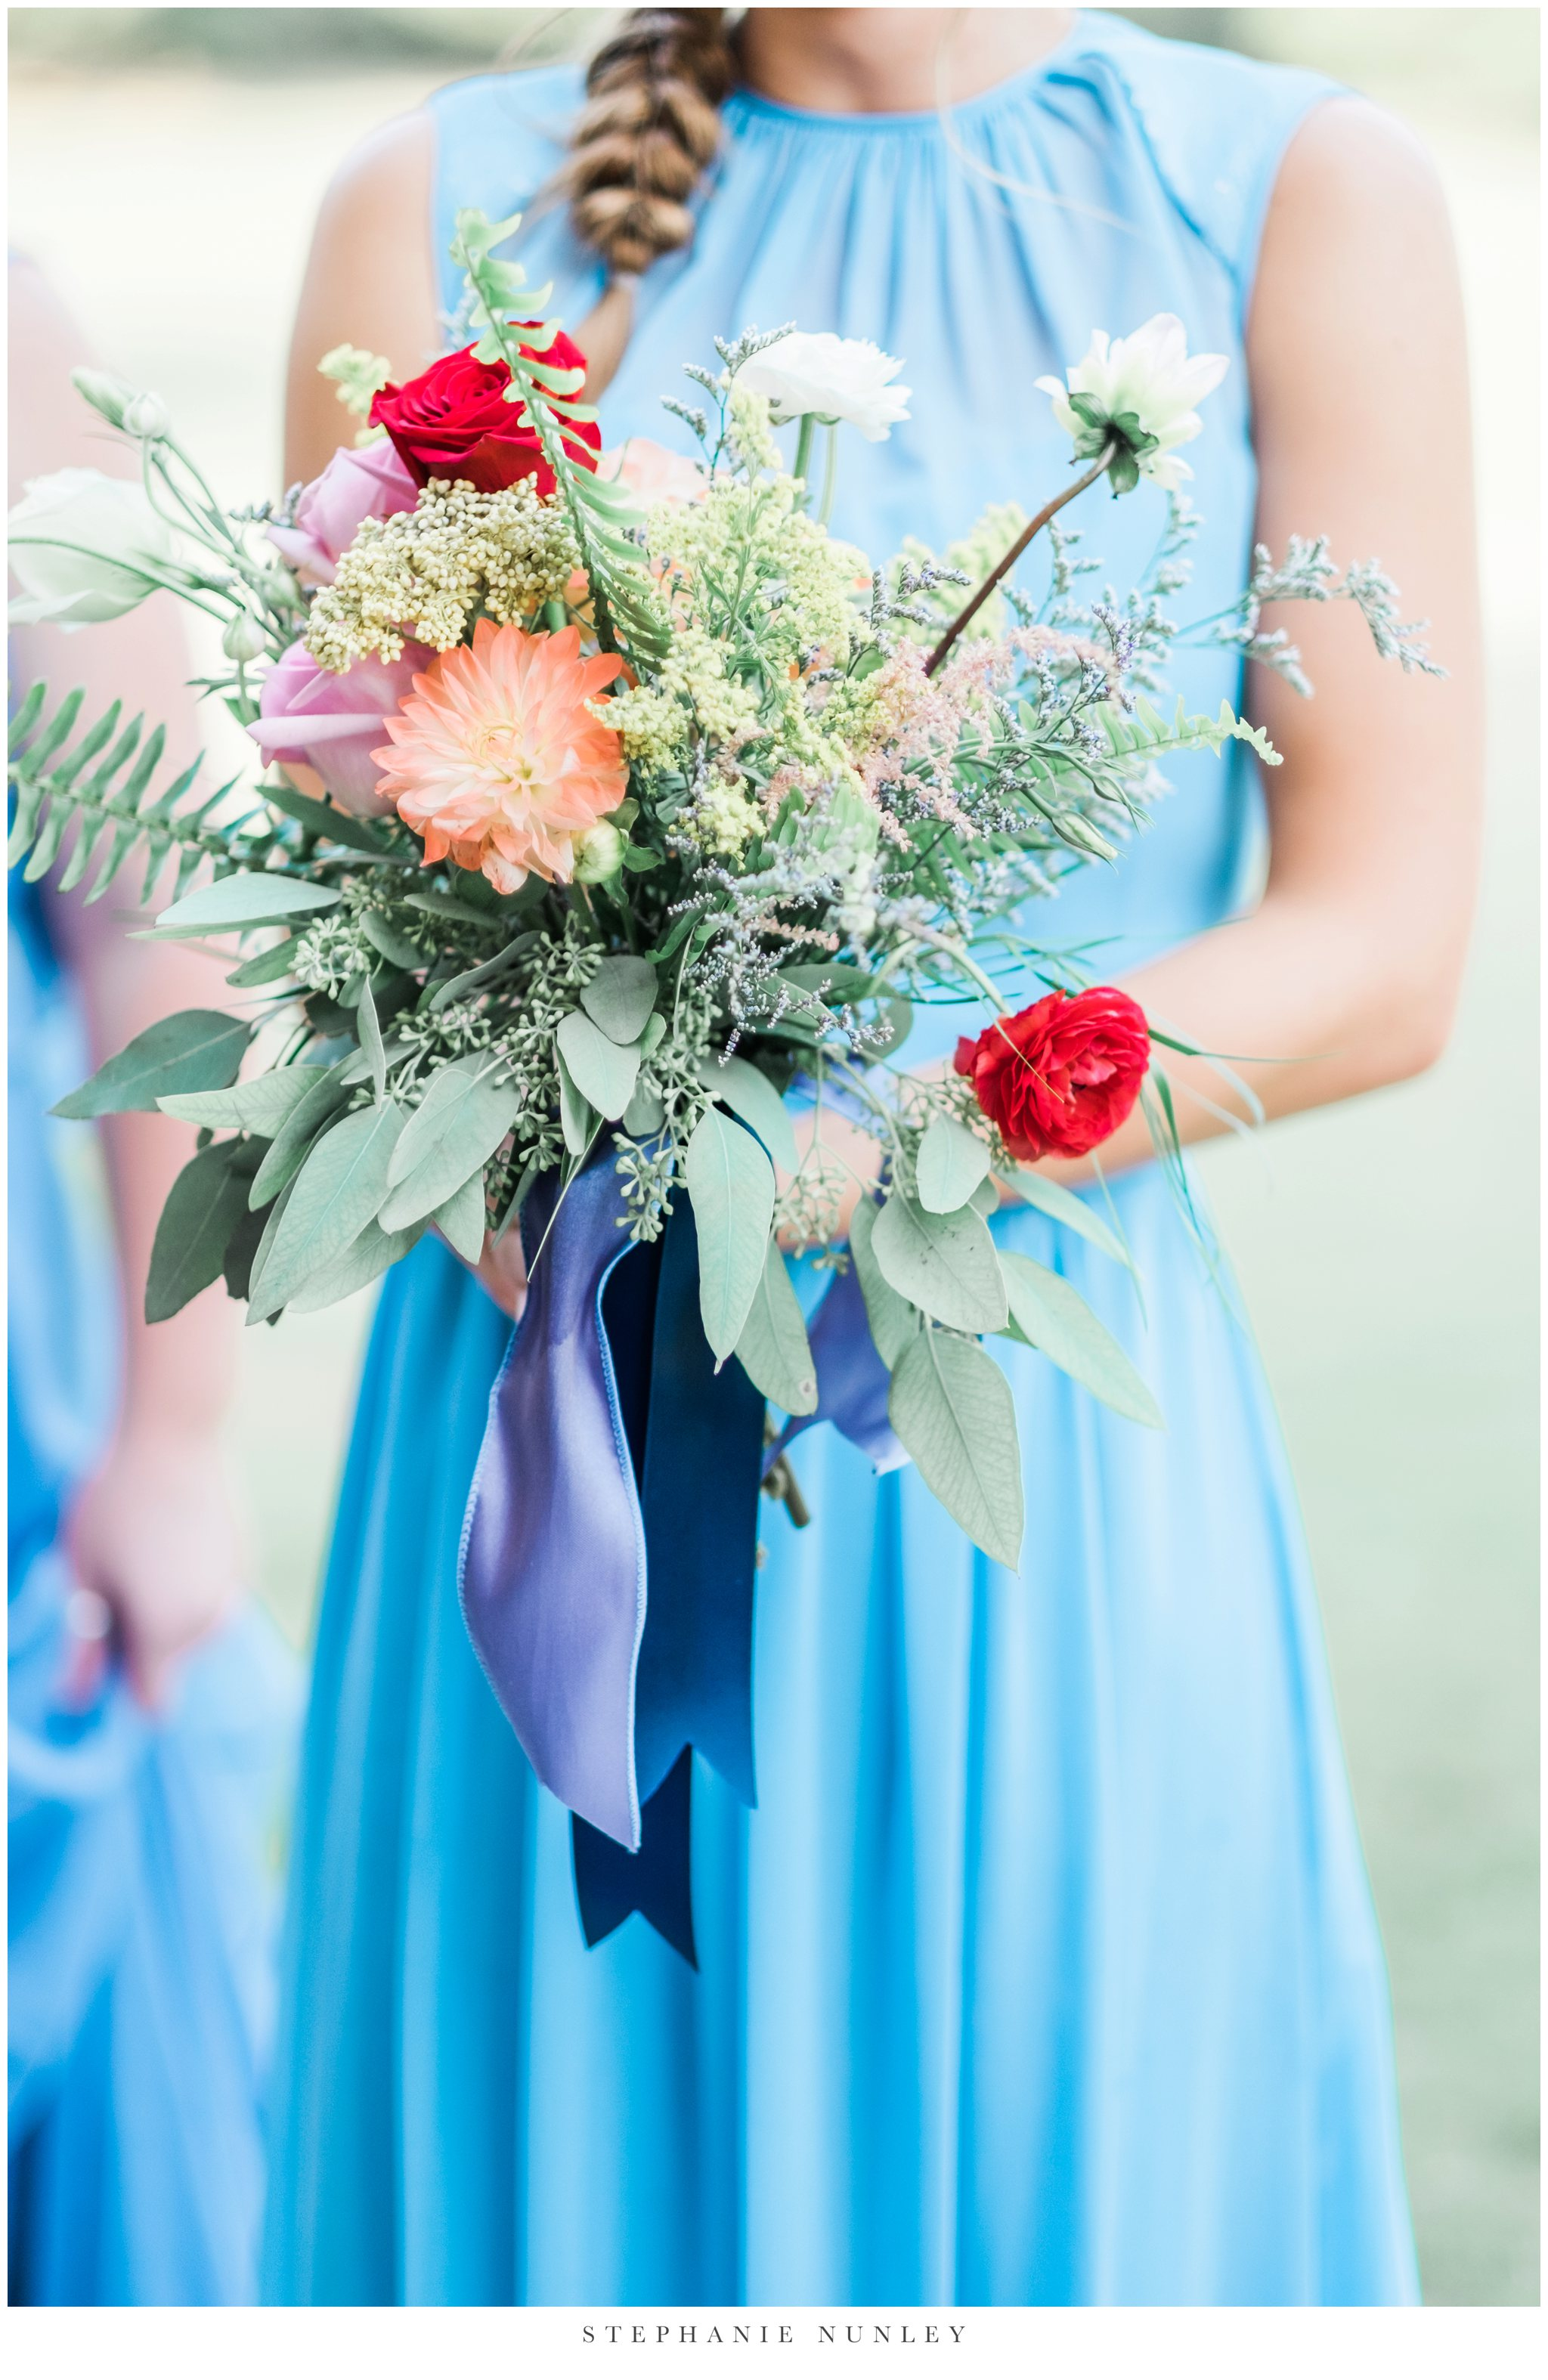 arkansas-wedding-with-lush-wildflower-bouquet-0096.jpg